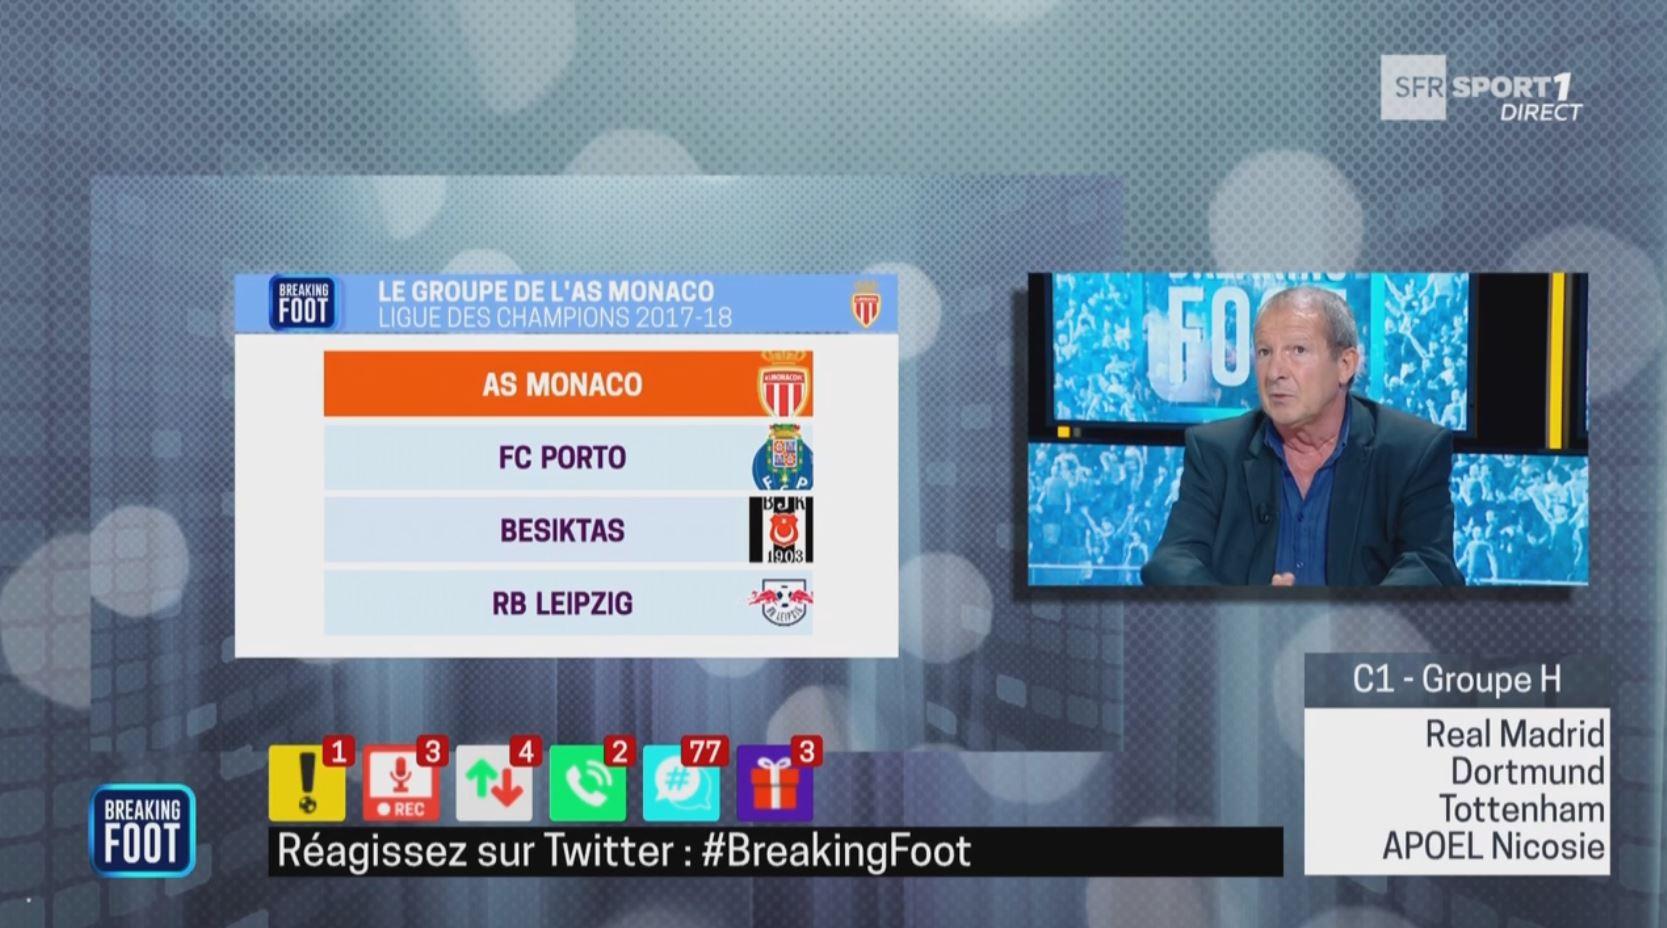 Bayern Munich : Ancelotti ravi de retrouver le PSG